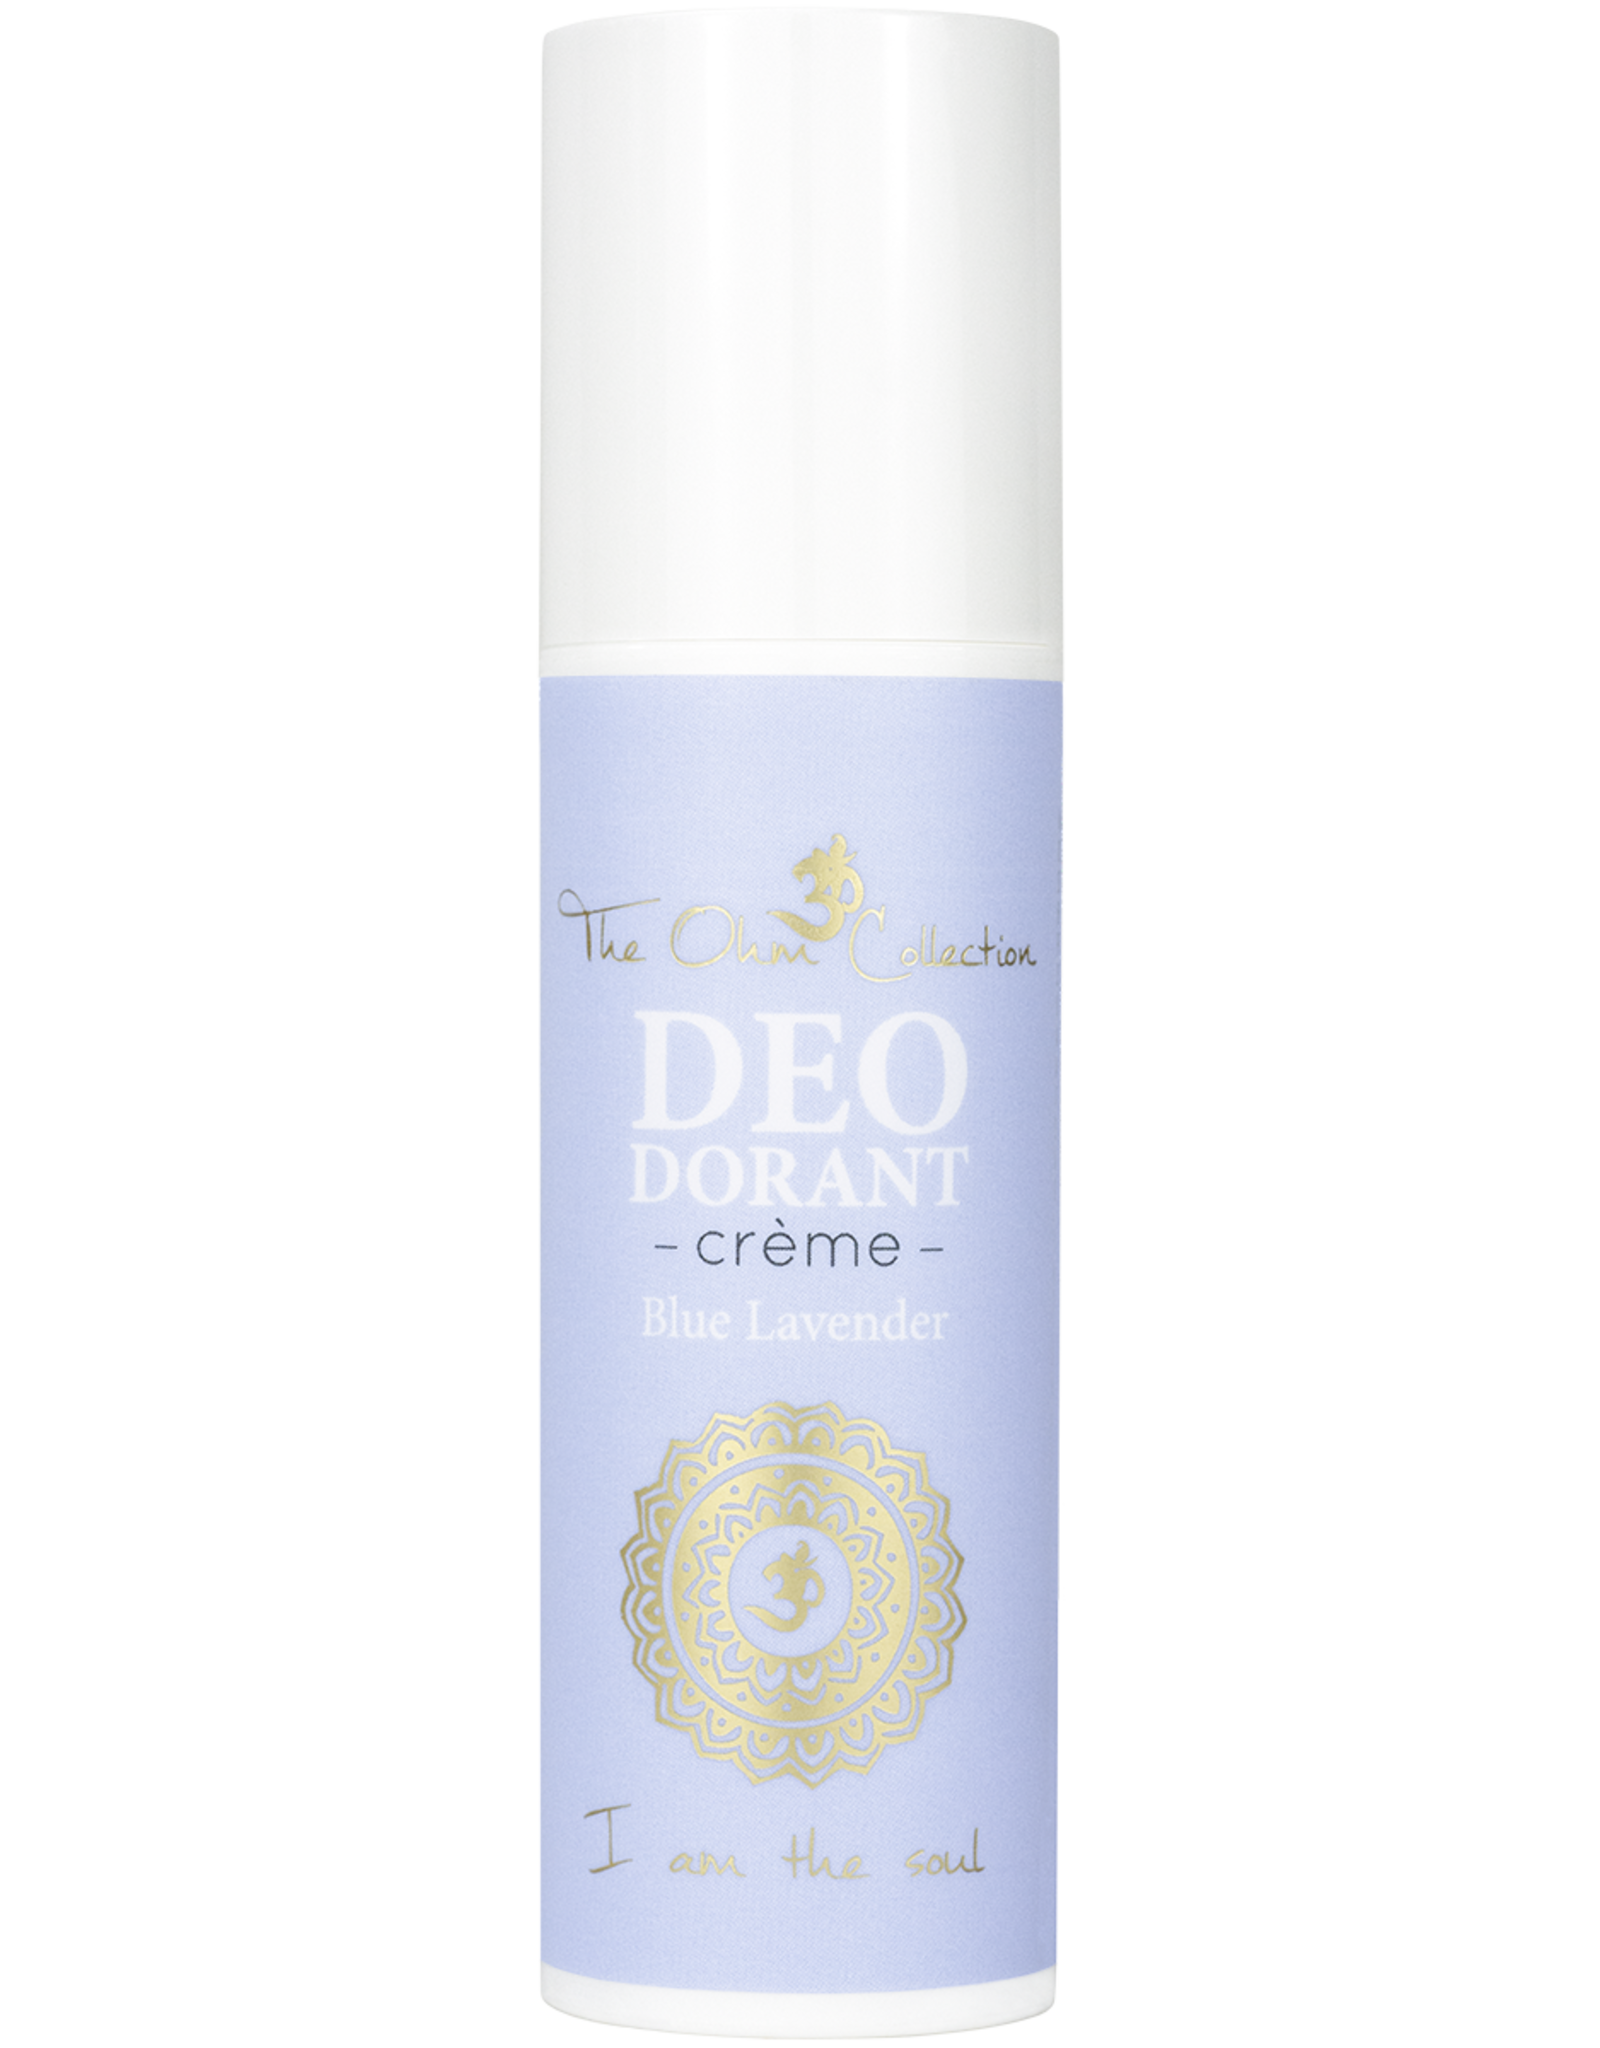 Ohm Deo Dorant Creme Blue Lavender 50 ml